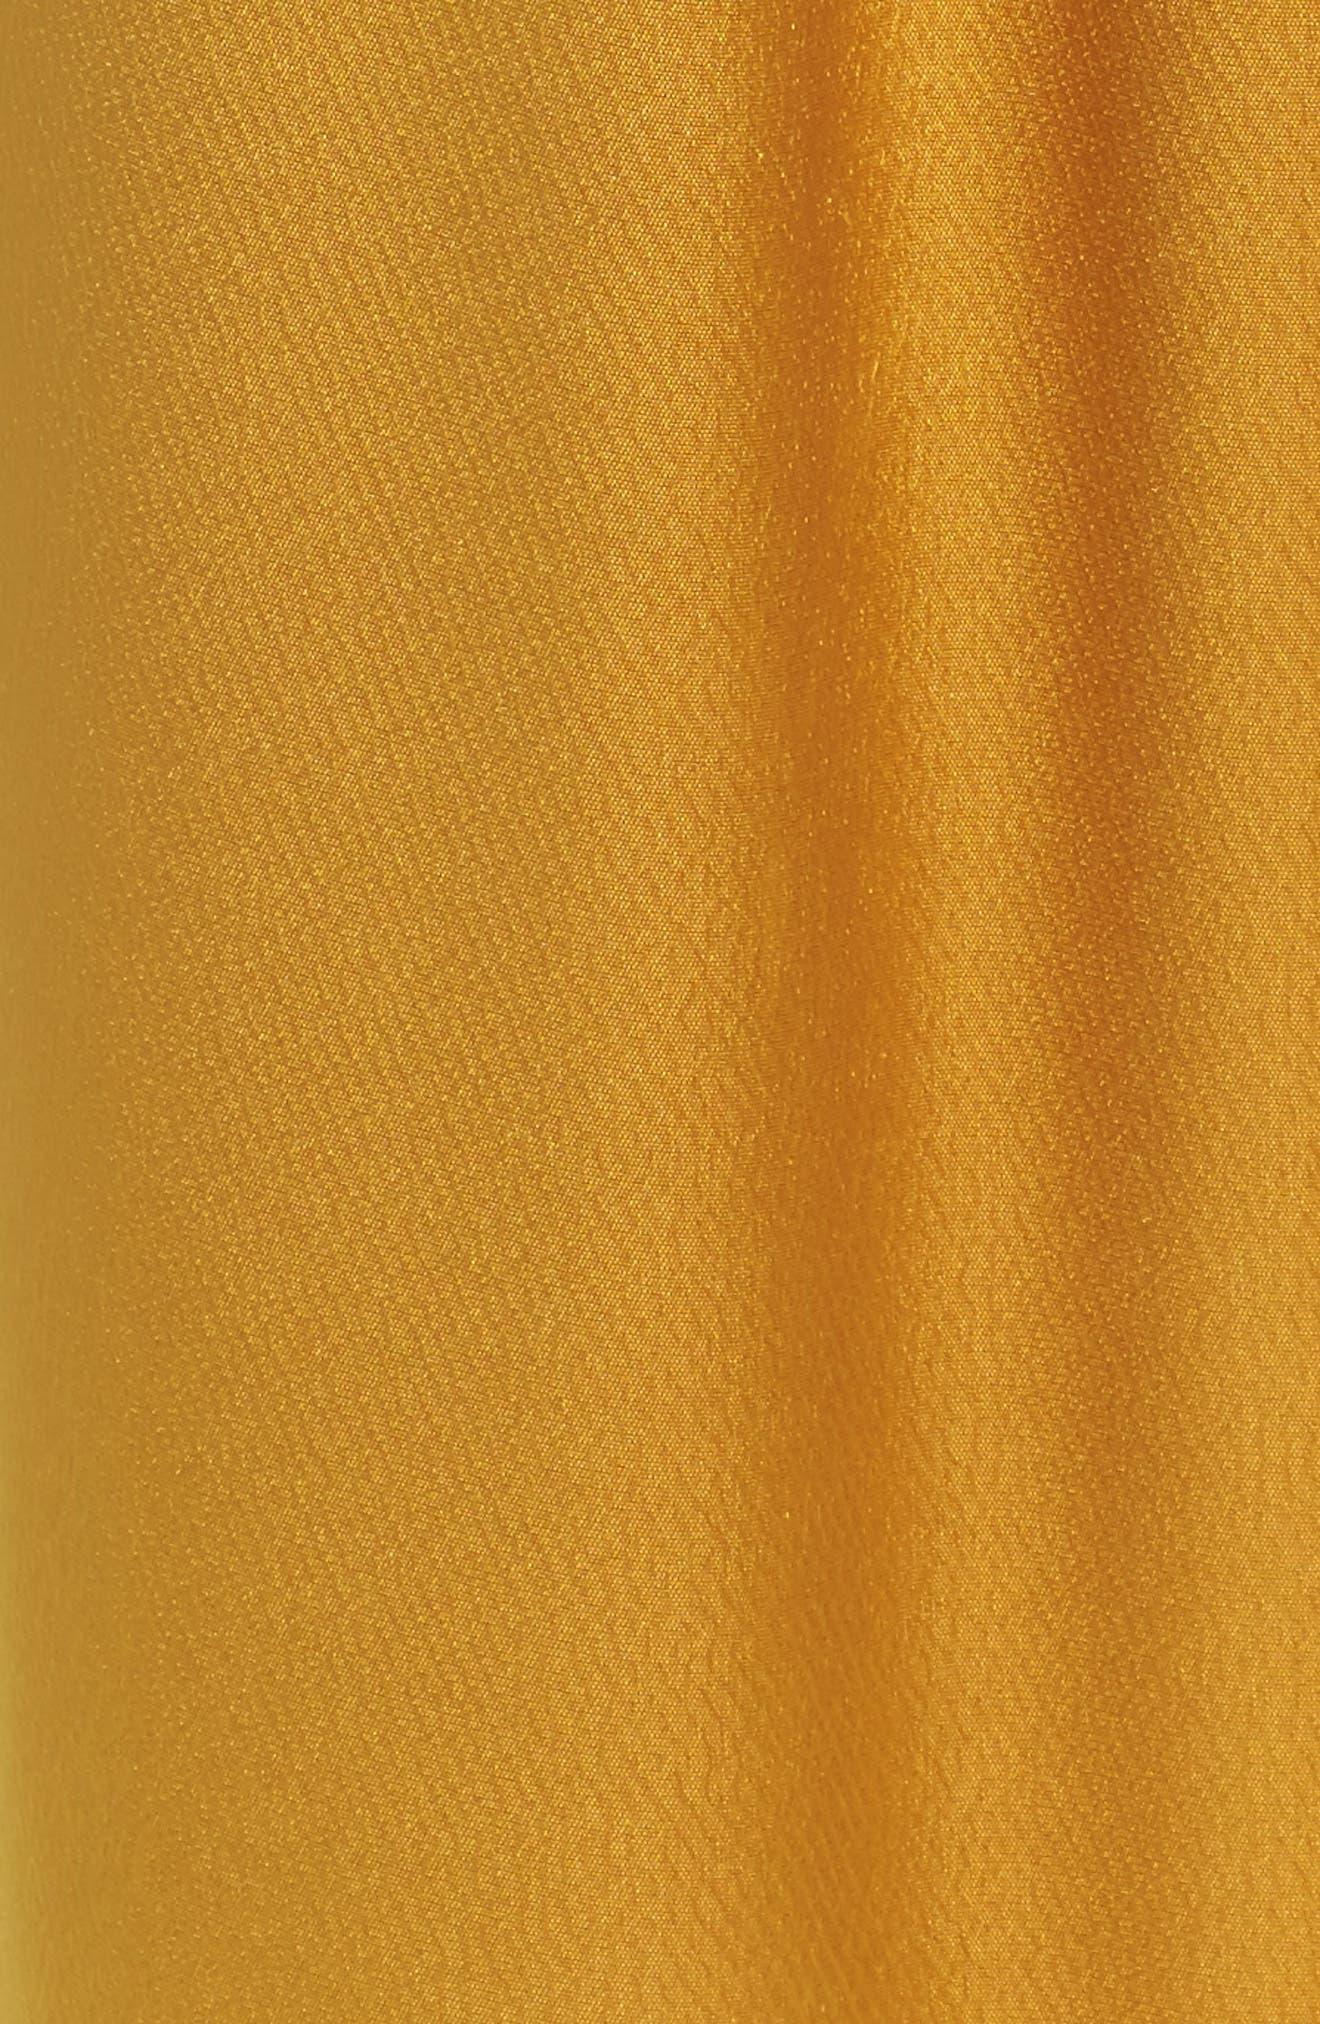 Fancy Pleated Front Satin Pants,                             Alternate thumbnail 5, color,                             700